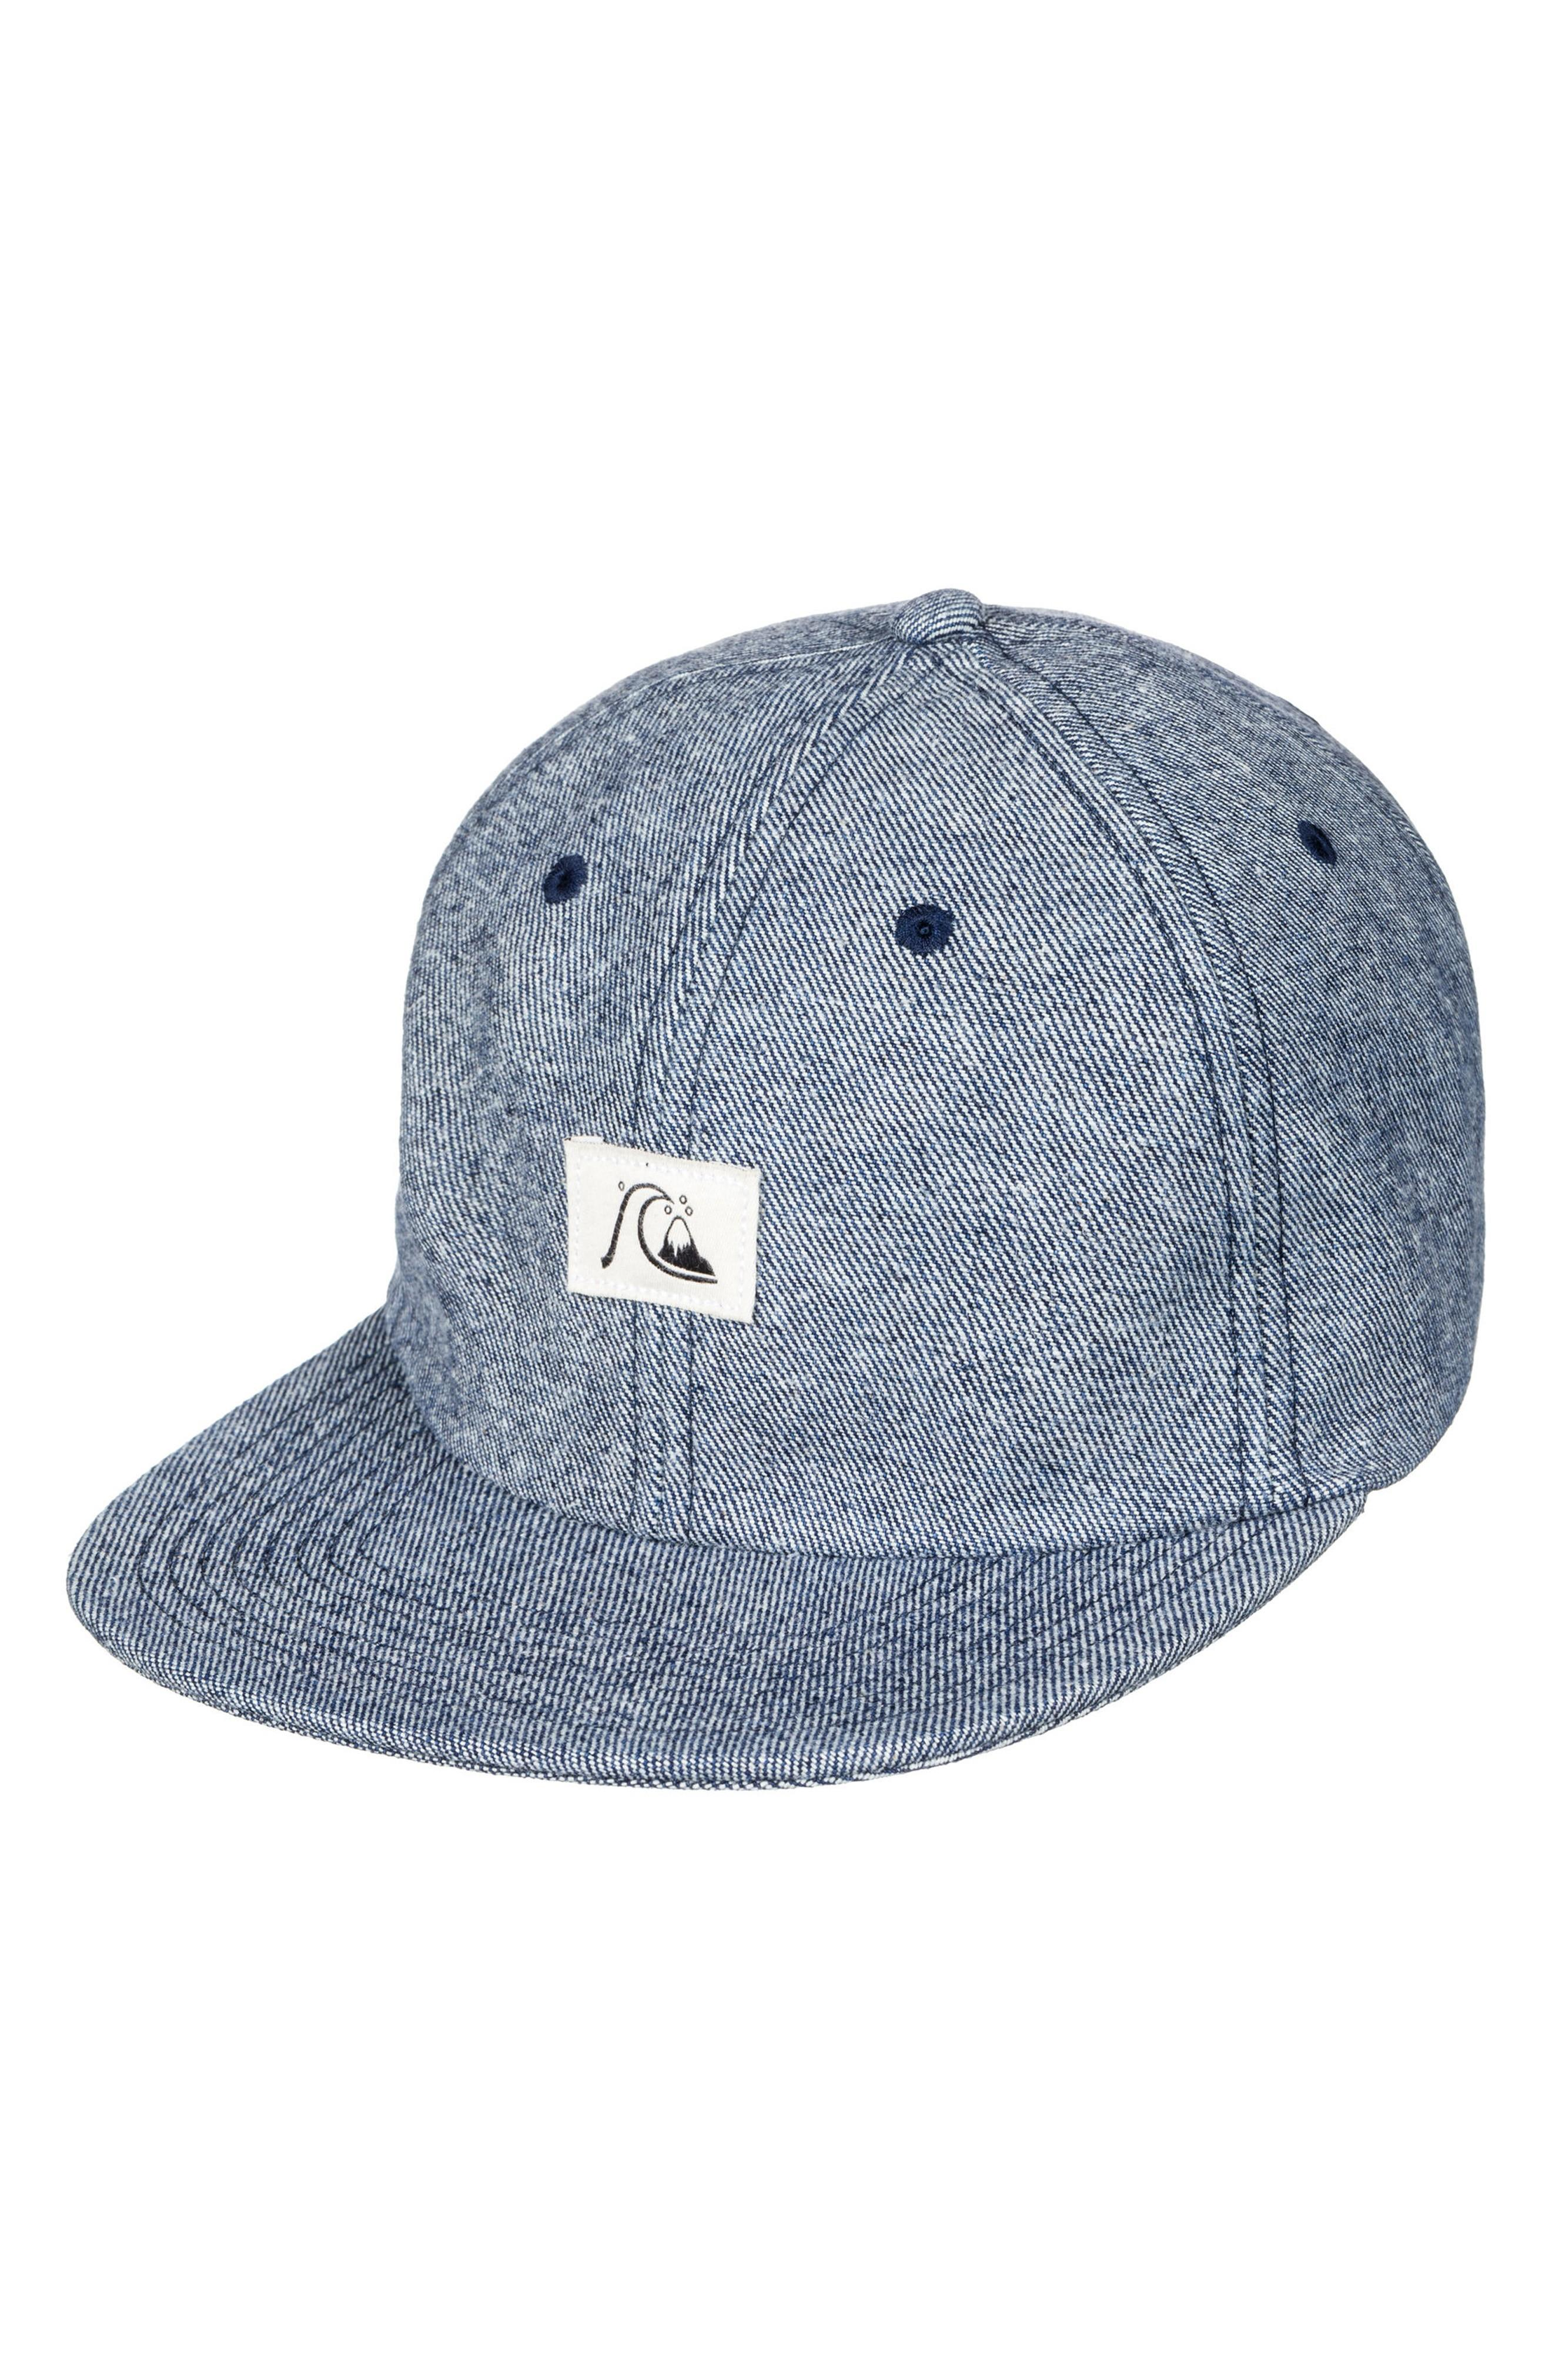 huge discount 34605 2ba2c Quiksilver Pinchfield Snapback Baseball Cap - Blue In Dusk Blue